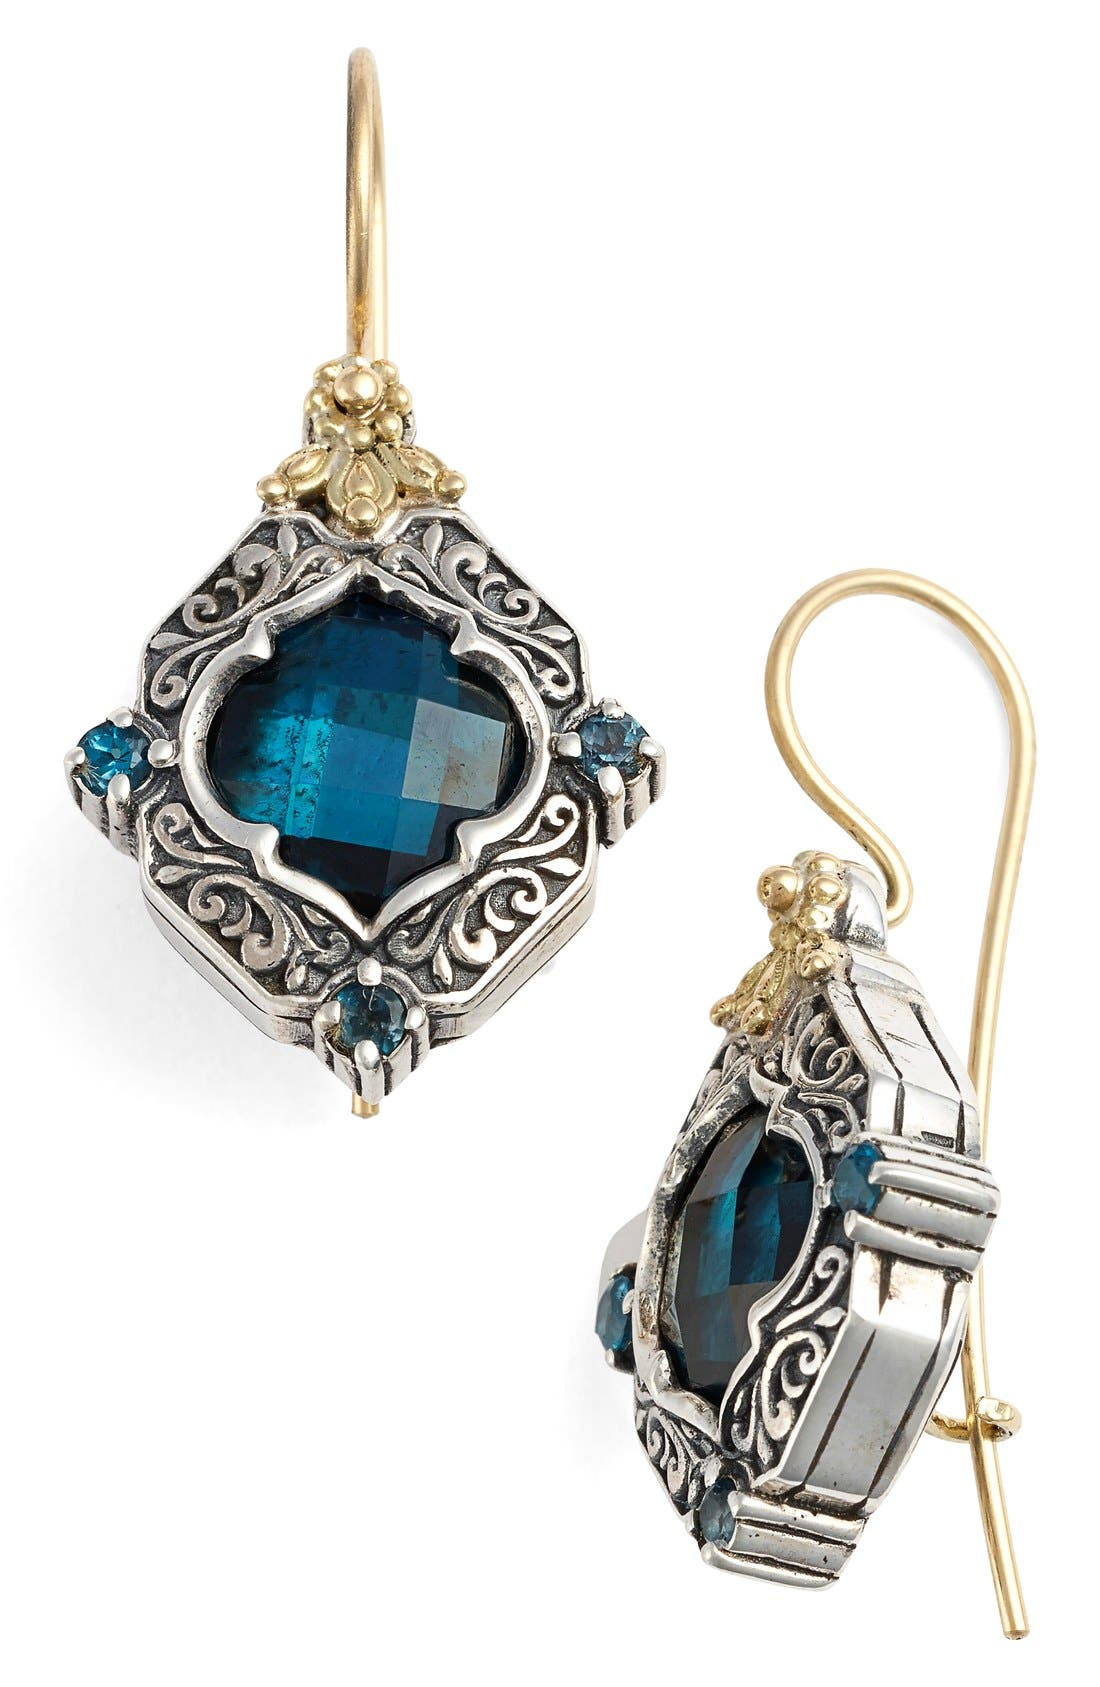 'Thalassa' Drop Earrings,                             Main thumbnail 1, color,                             SILVER/ GOLD/ BLUE TOPAZ